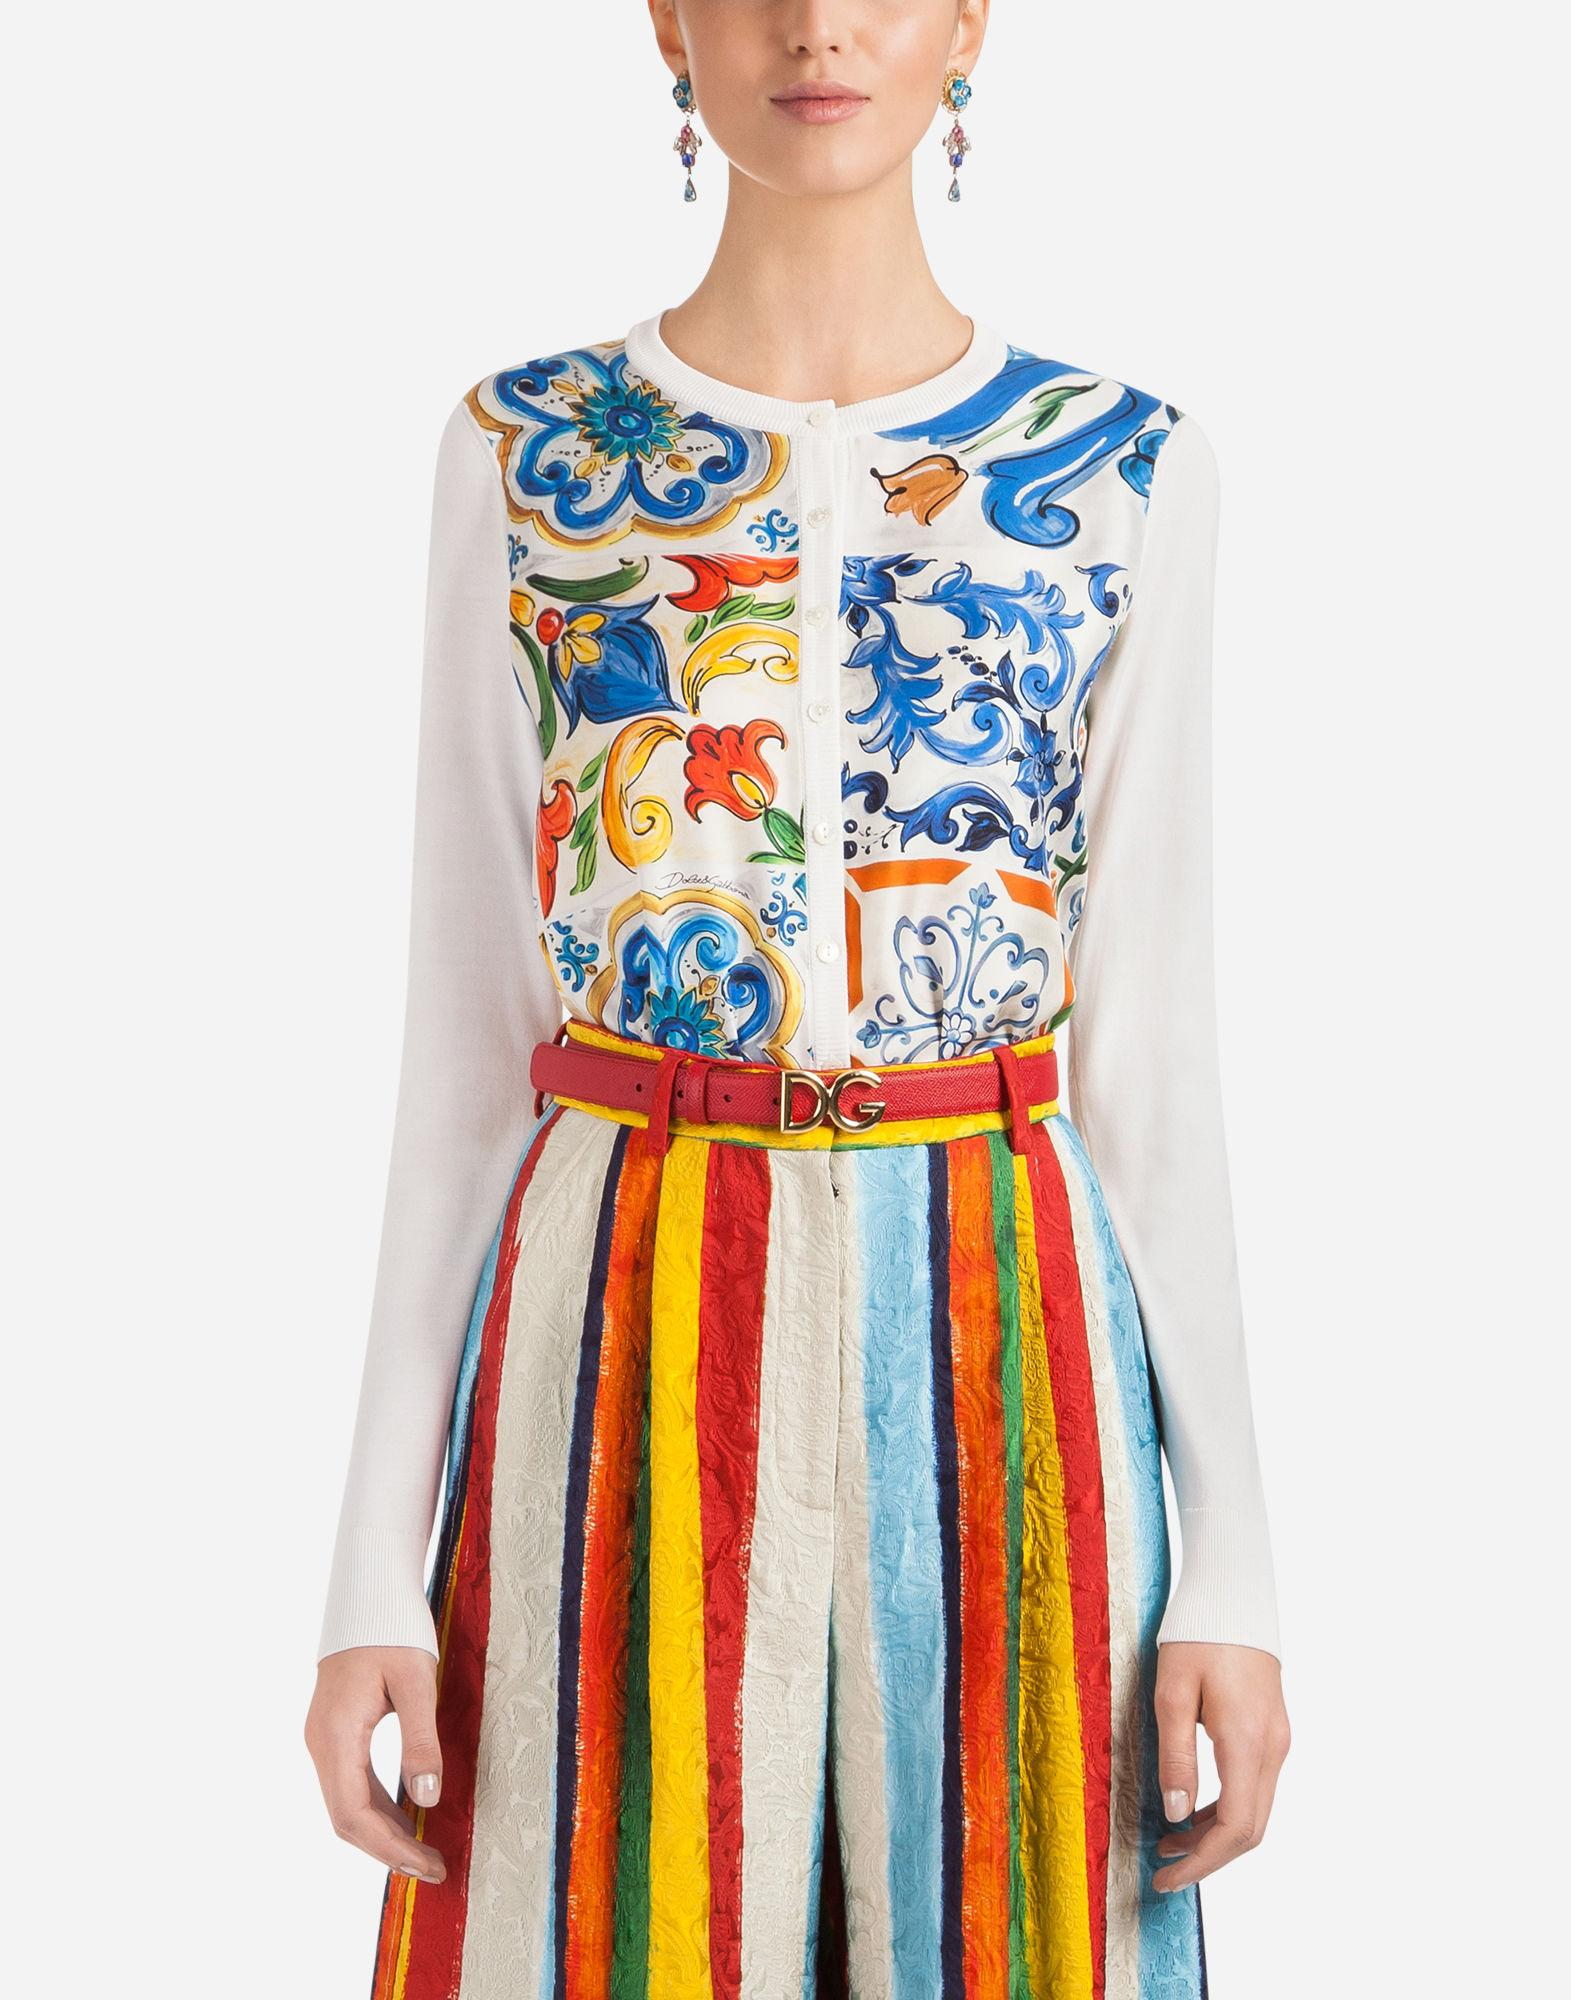 Dolce & Gabbana Silk Cardigan With Scarf Insert In White